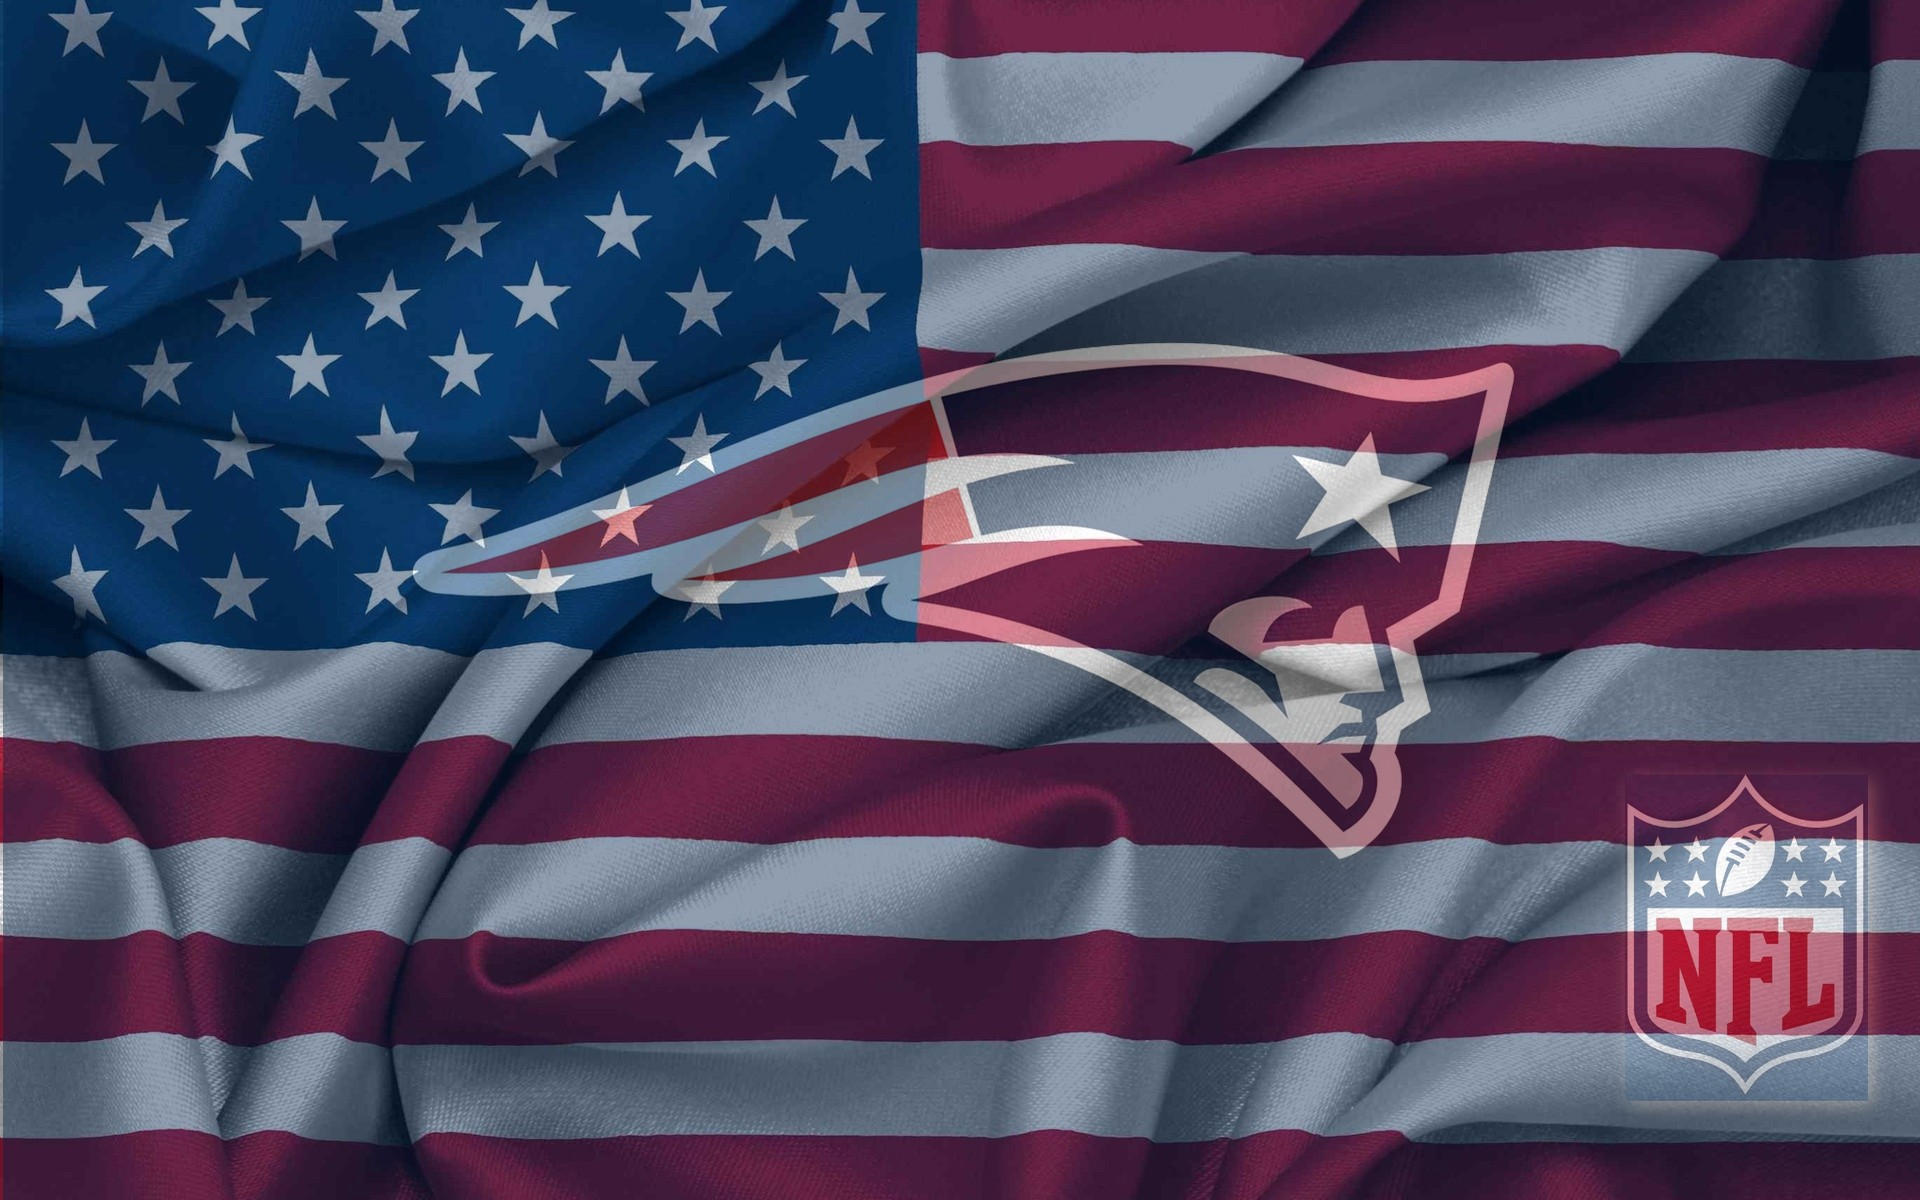 New England Patriots Logo With NFL Logo On USA Flag Wavy Canvas 1920x1200